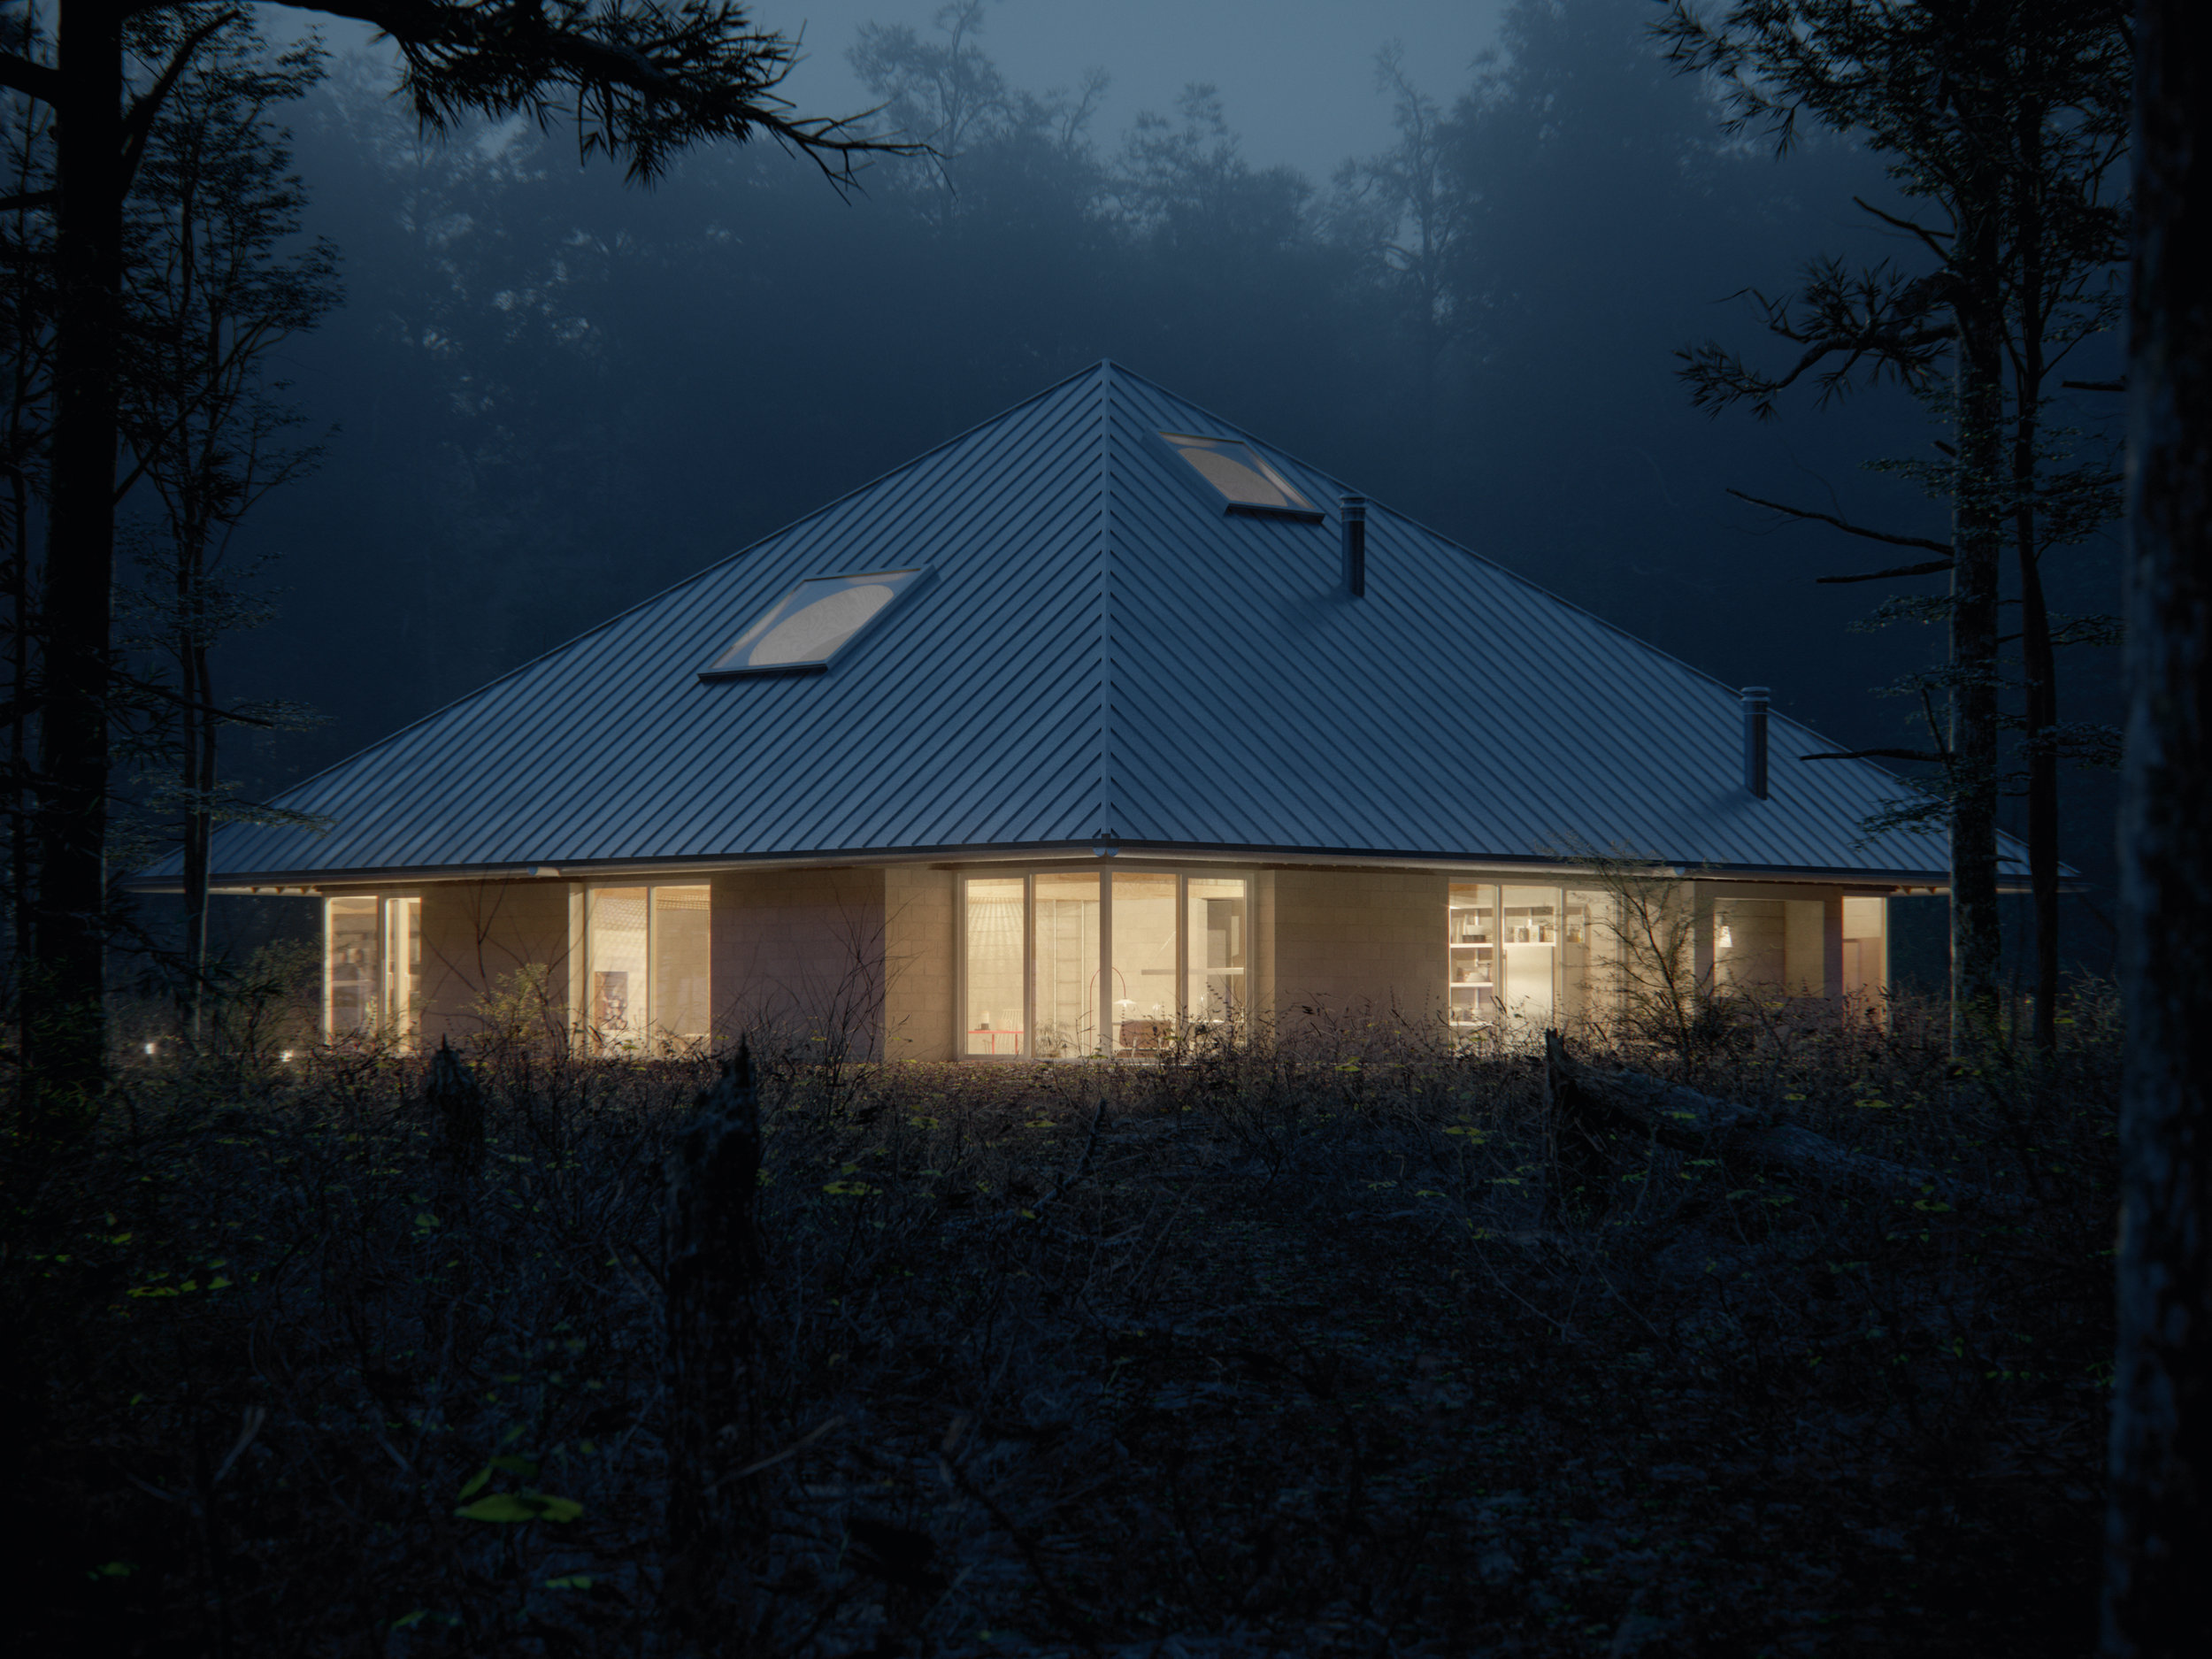 C10 Exterior Angled Night.jpg